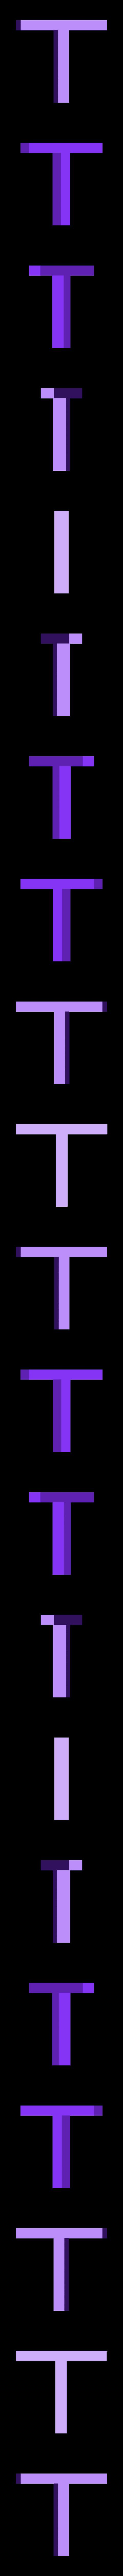 t.stl Download STL file QNET LOGO • Design to 3D print, alono